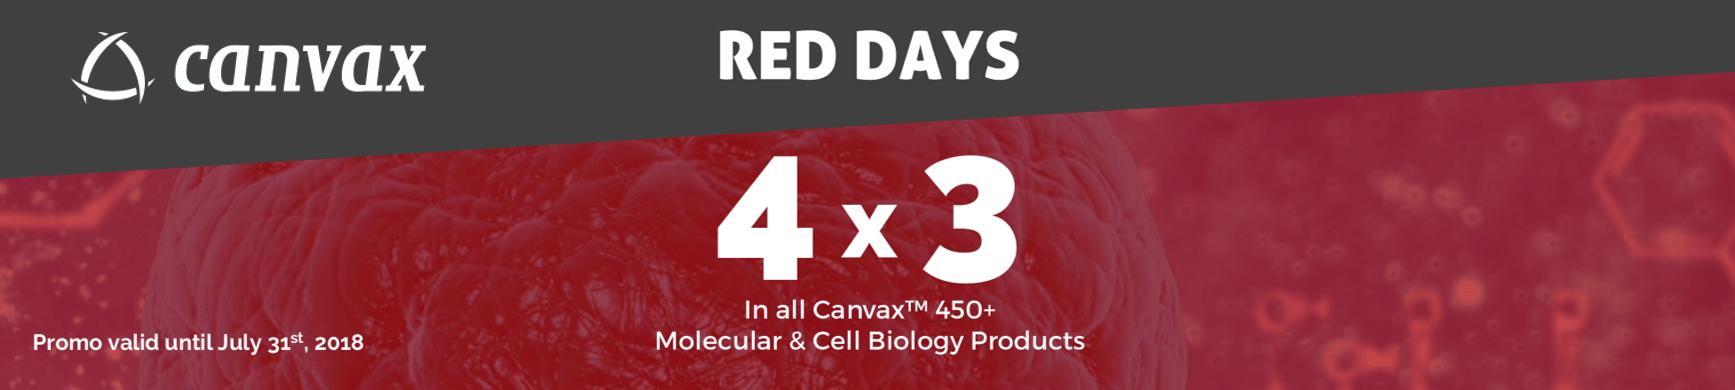 red days promo